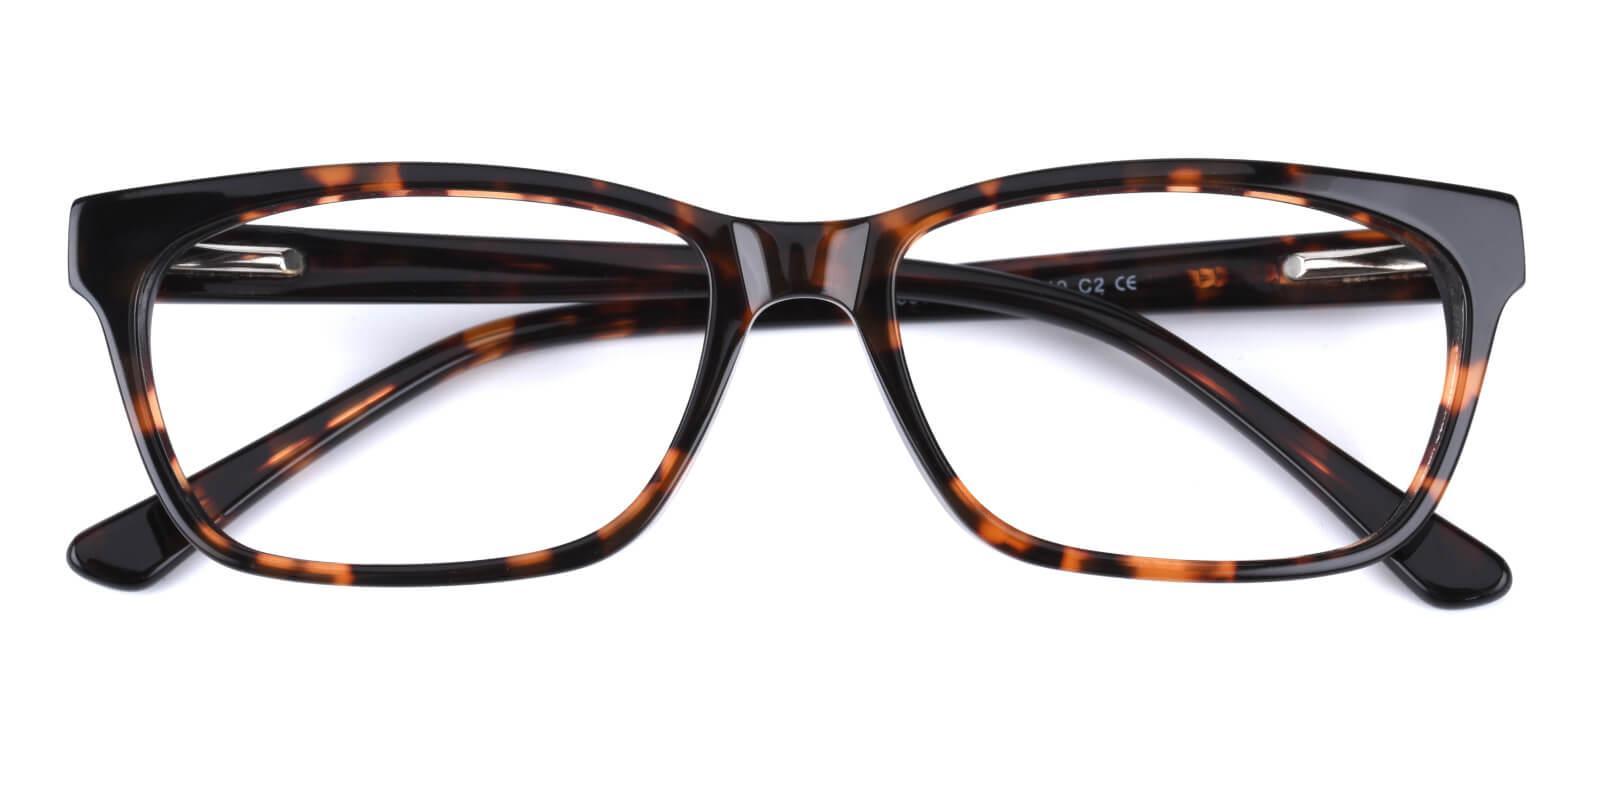 Mizura-Tortoise-Cat-Acetate-Eyeglasses-detail